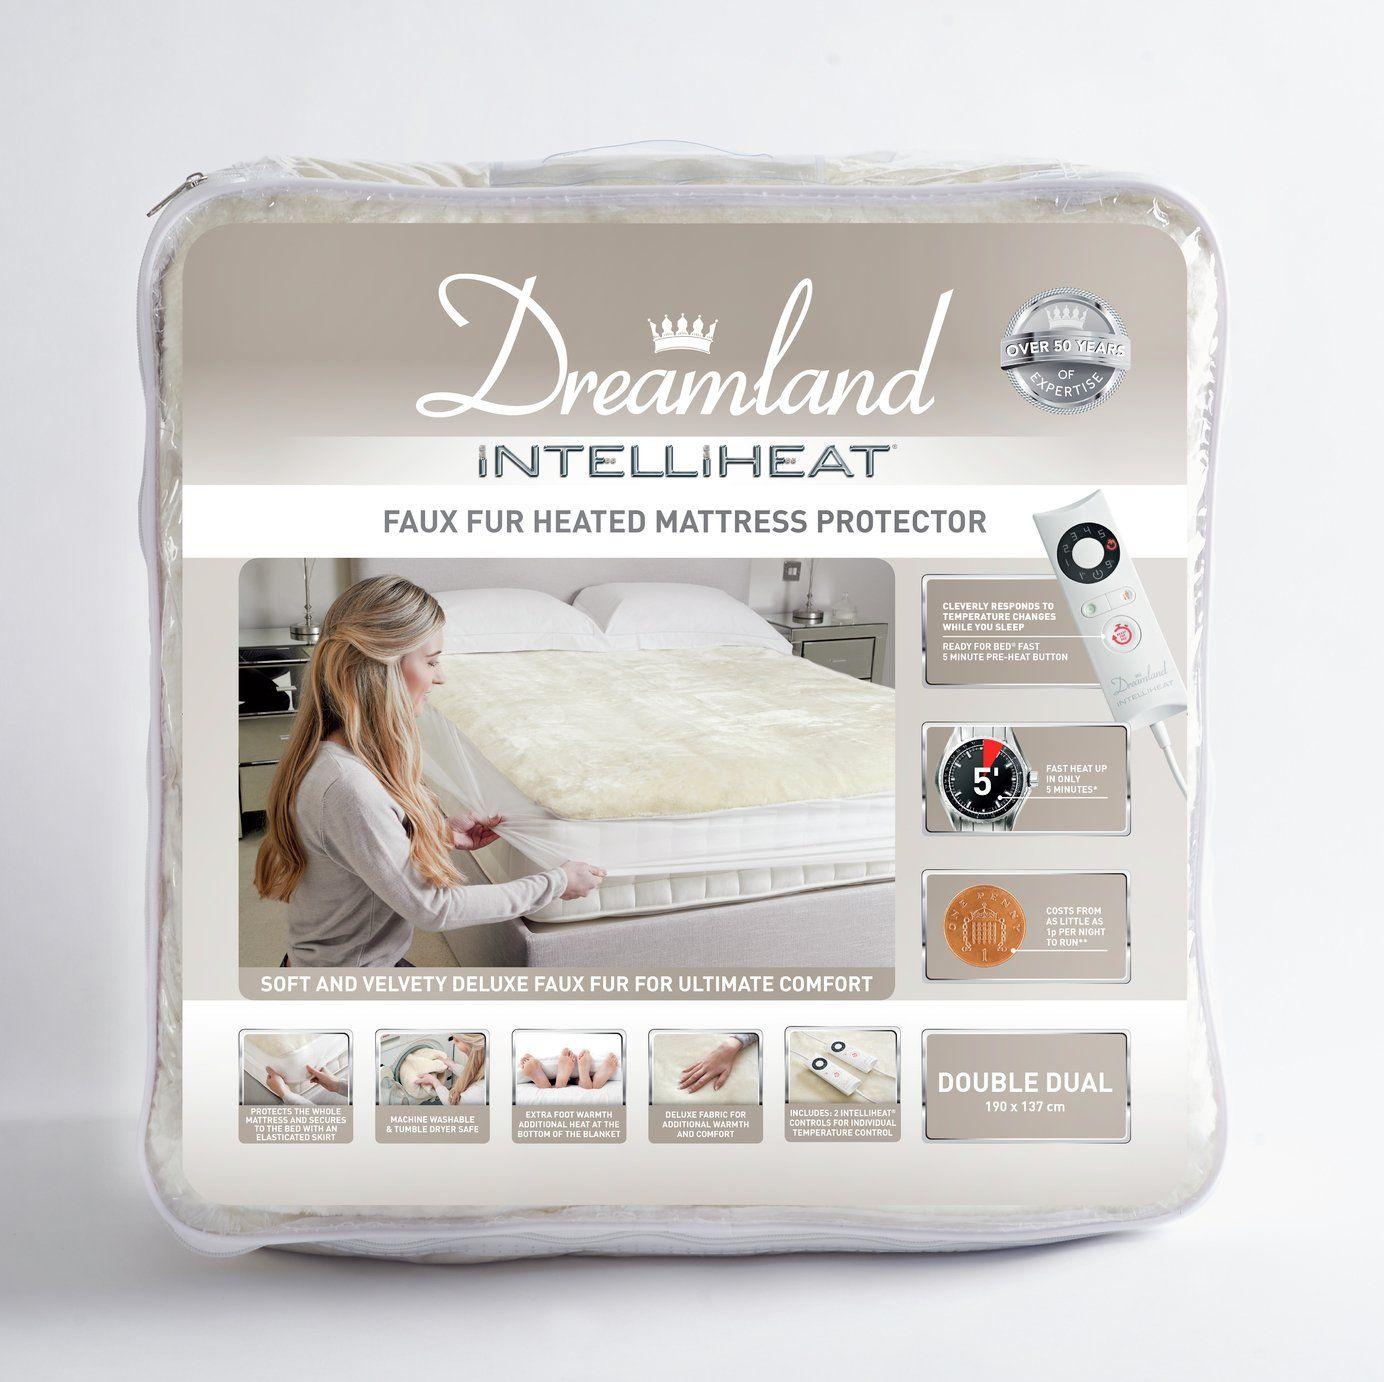 Buy Dreamland Heated Mattress Protector